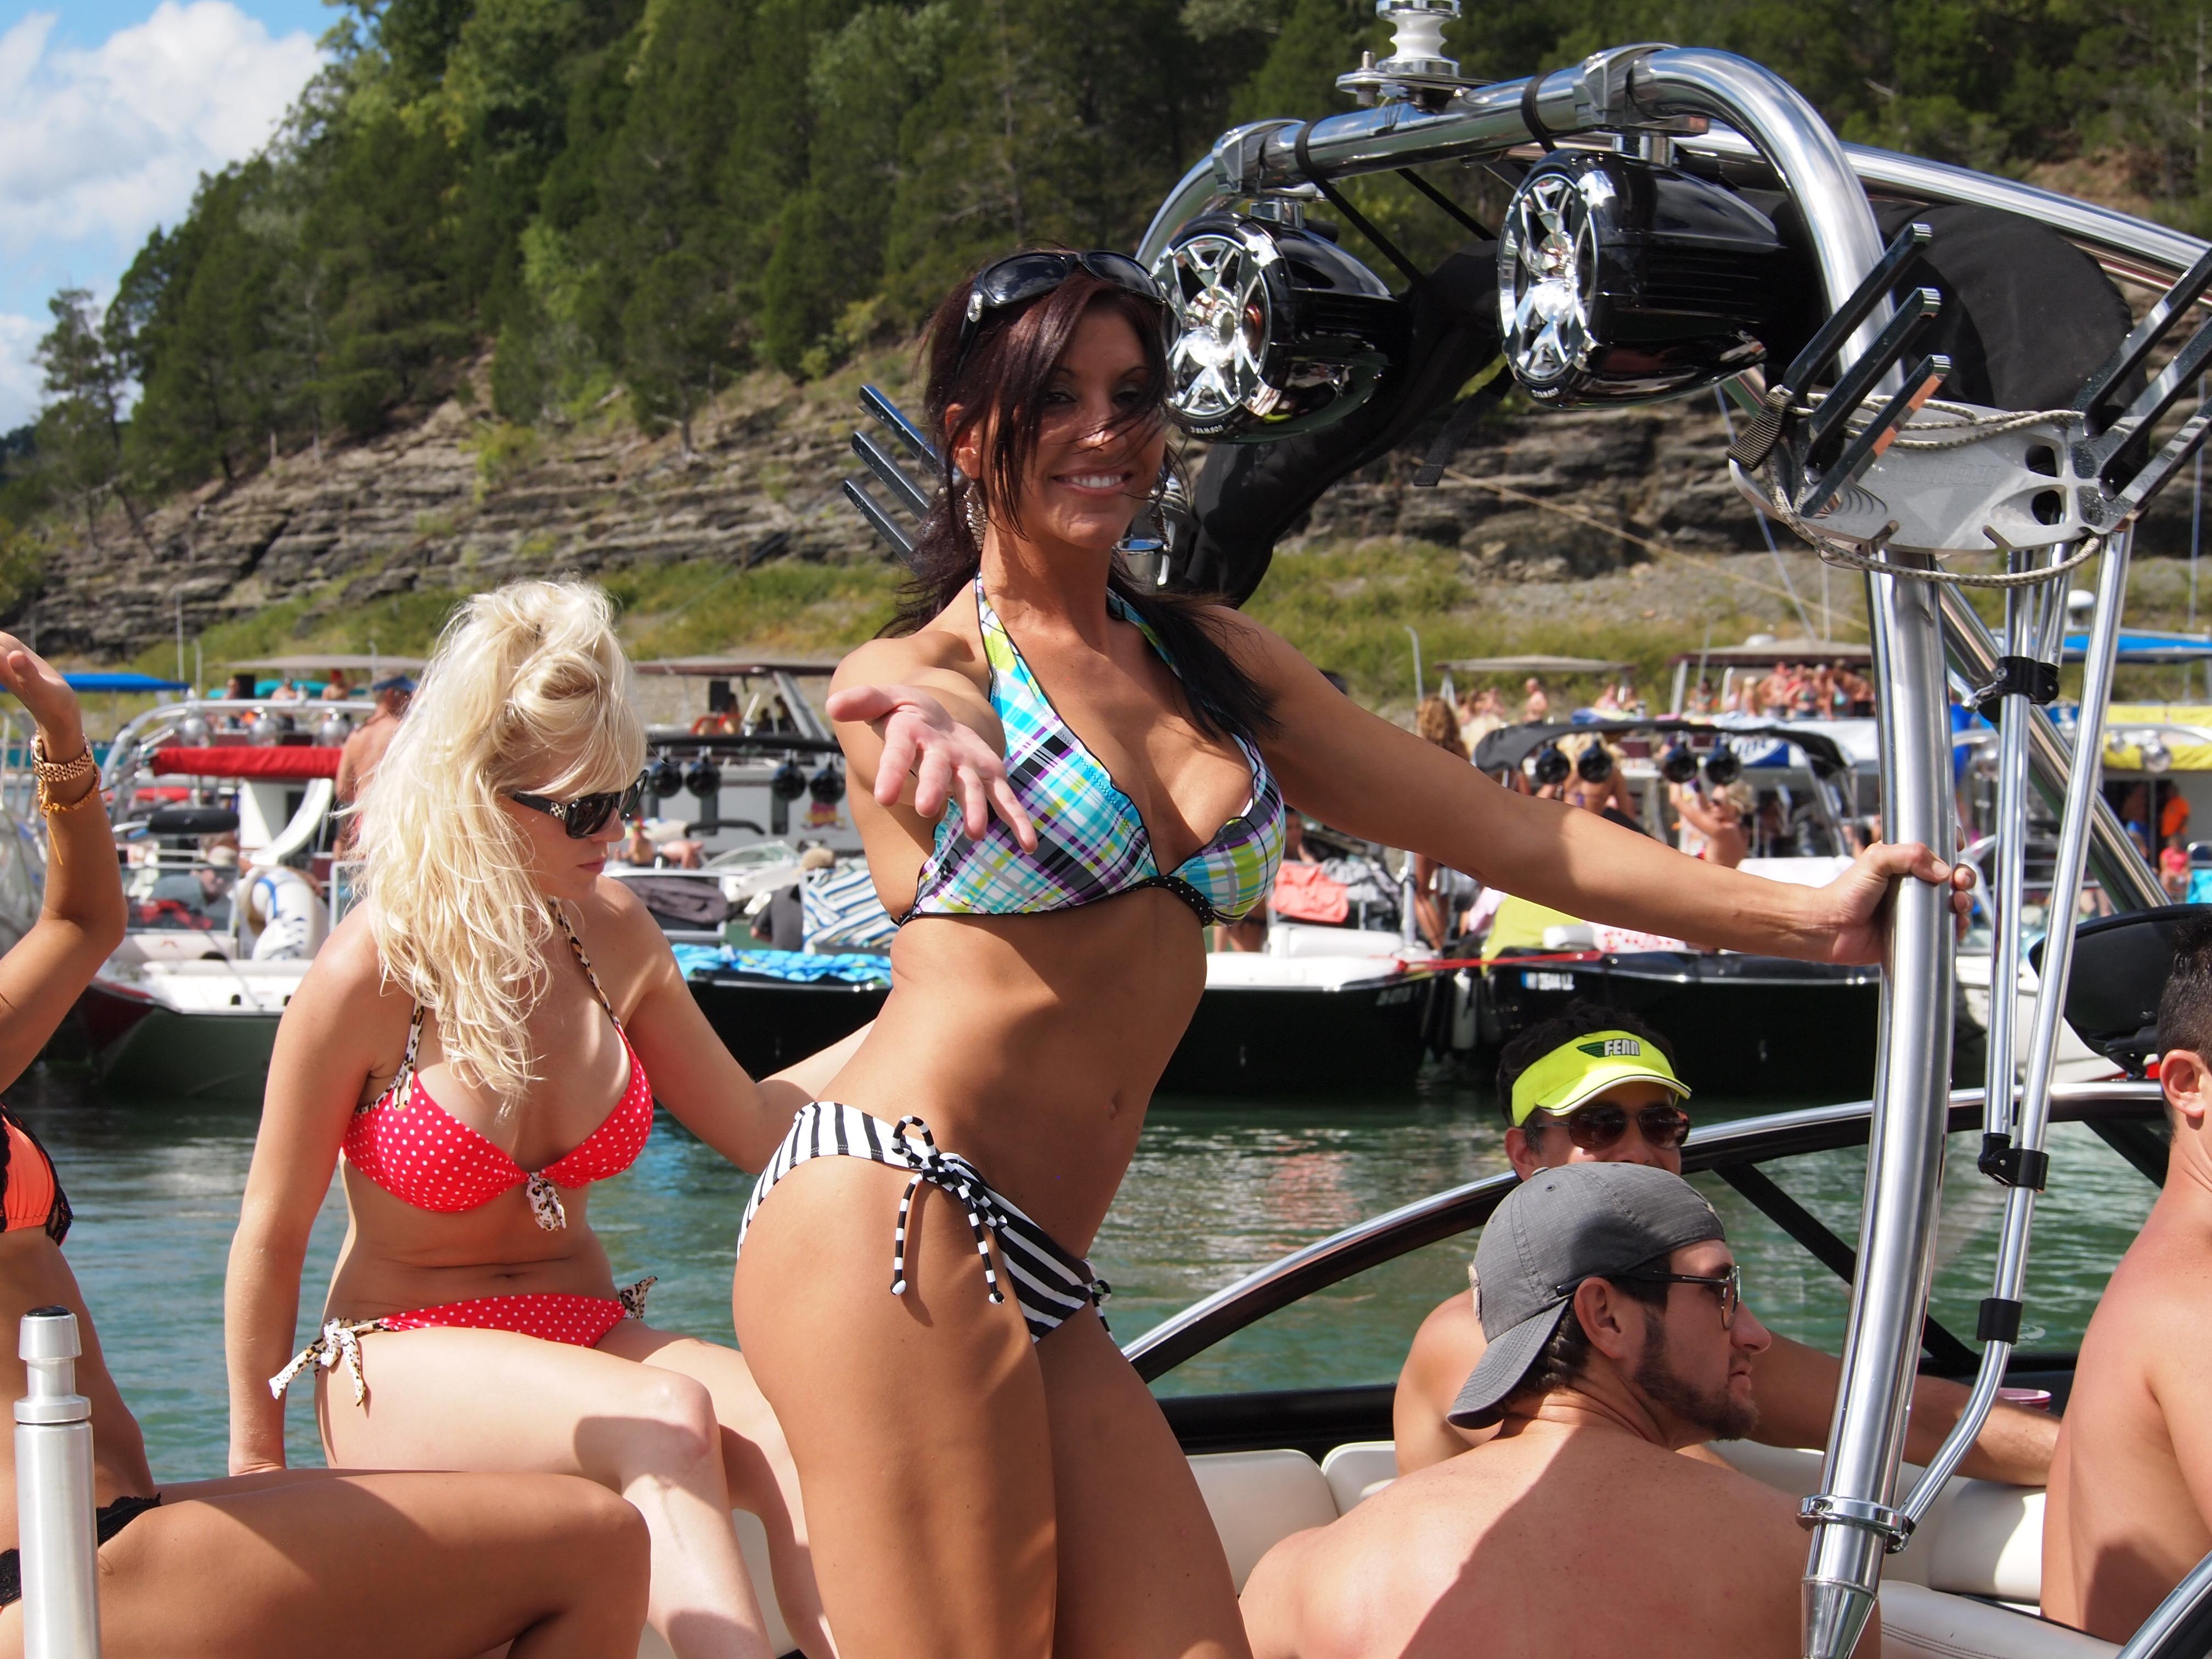 cumberland lake nude girls